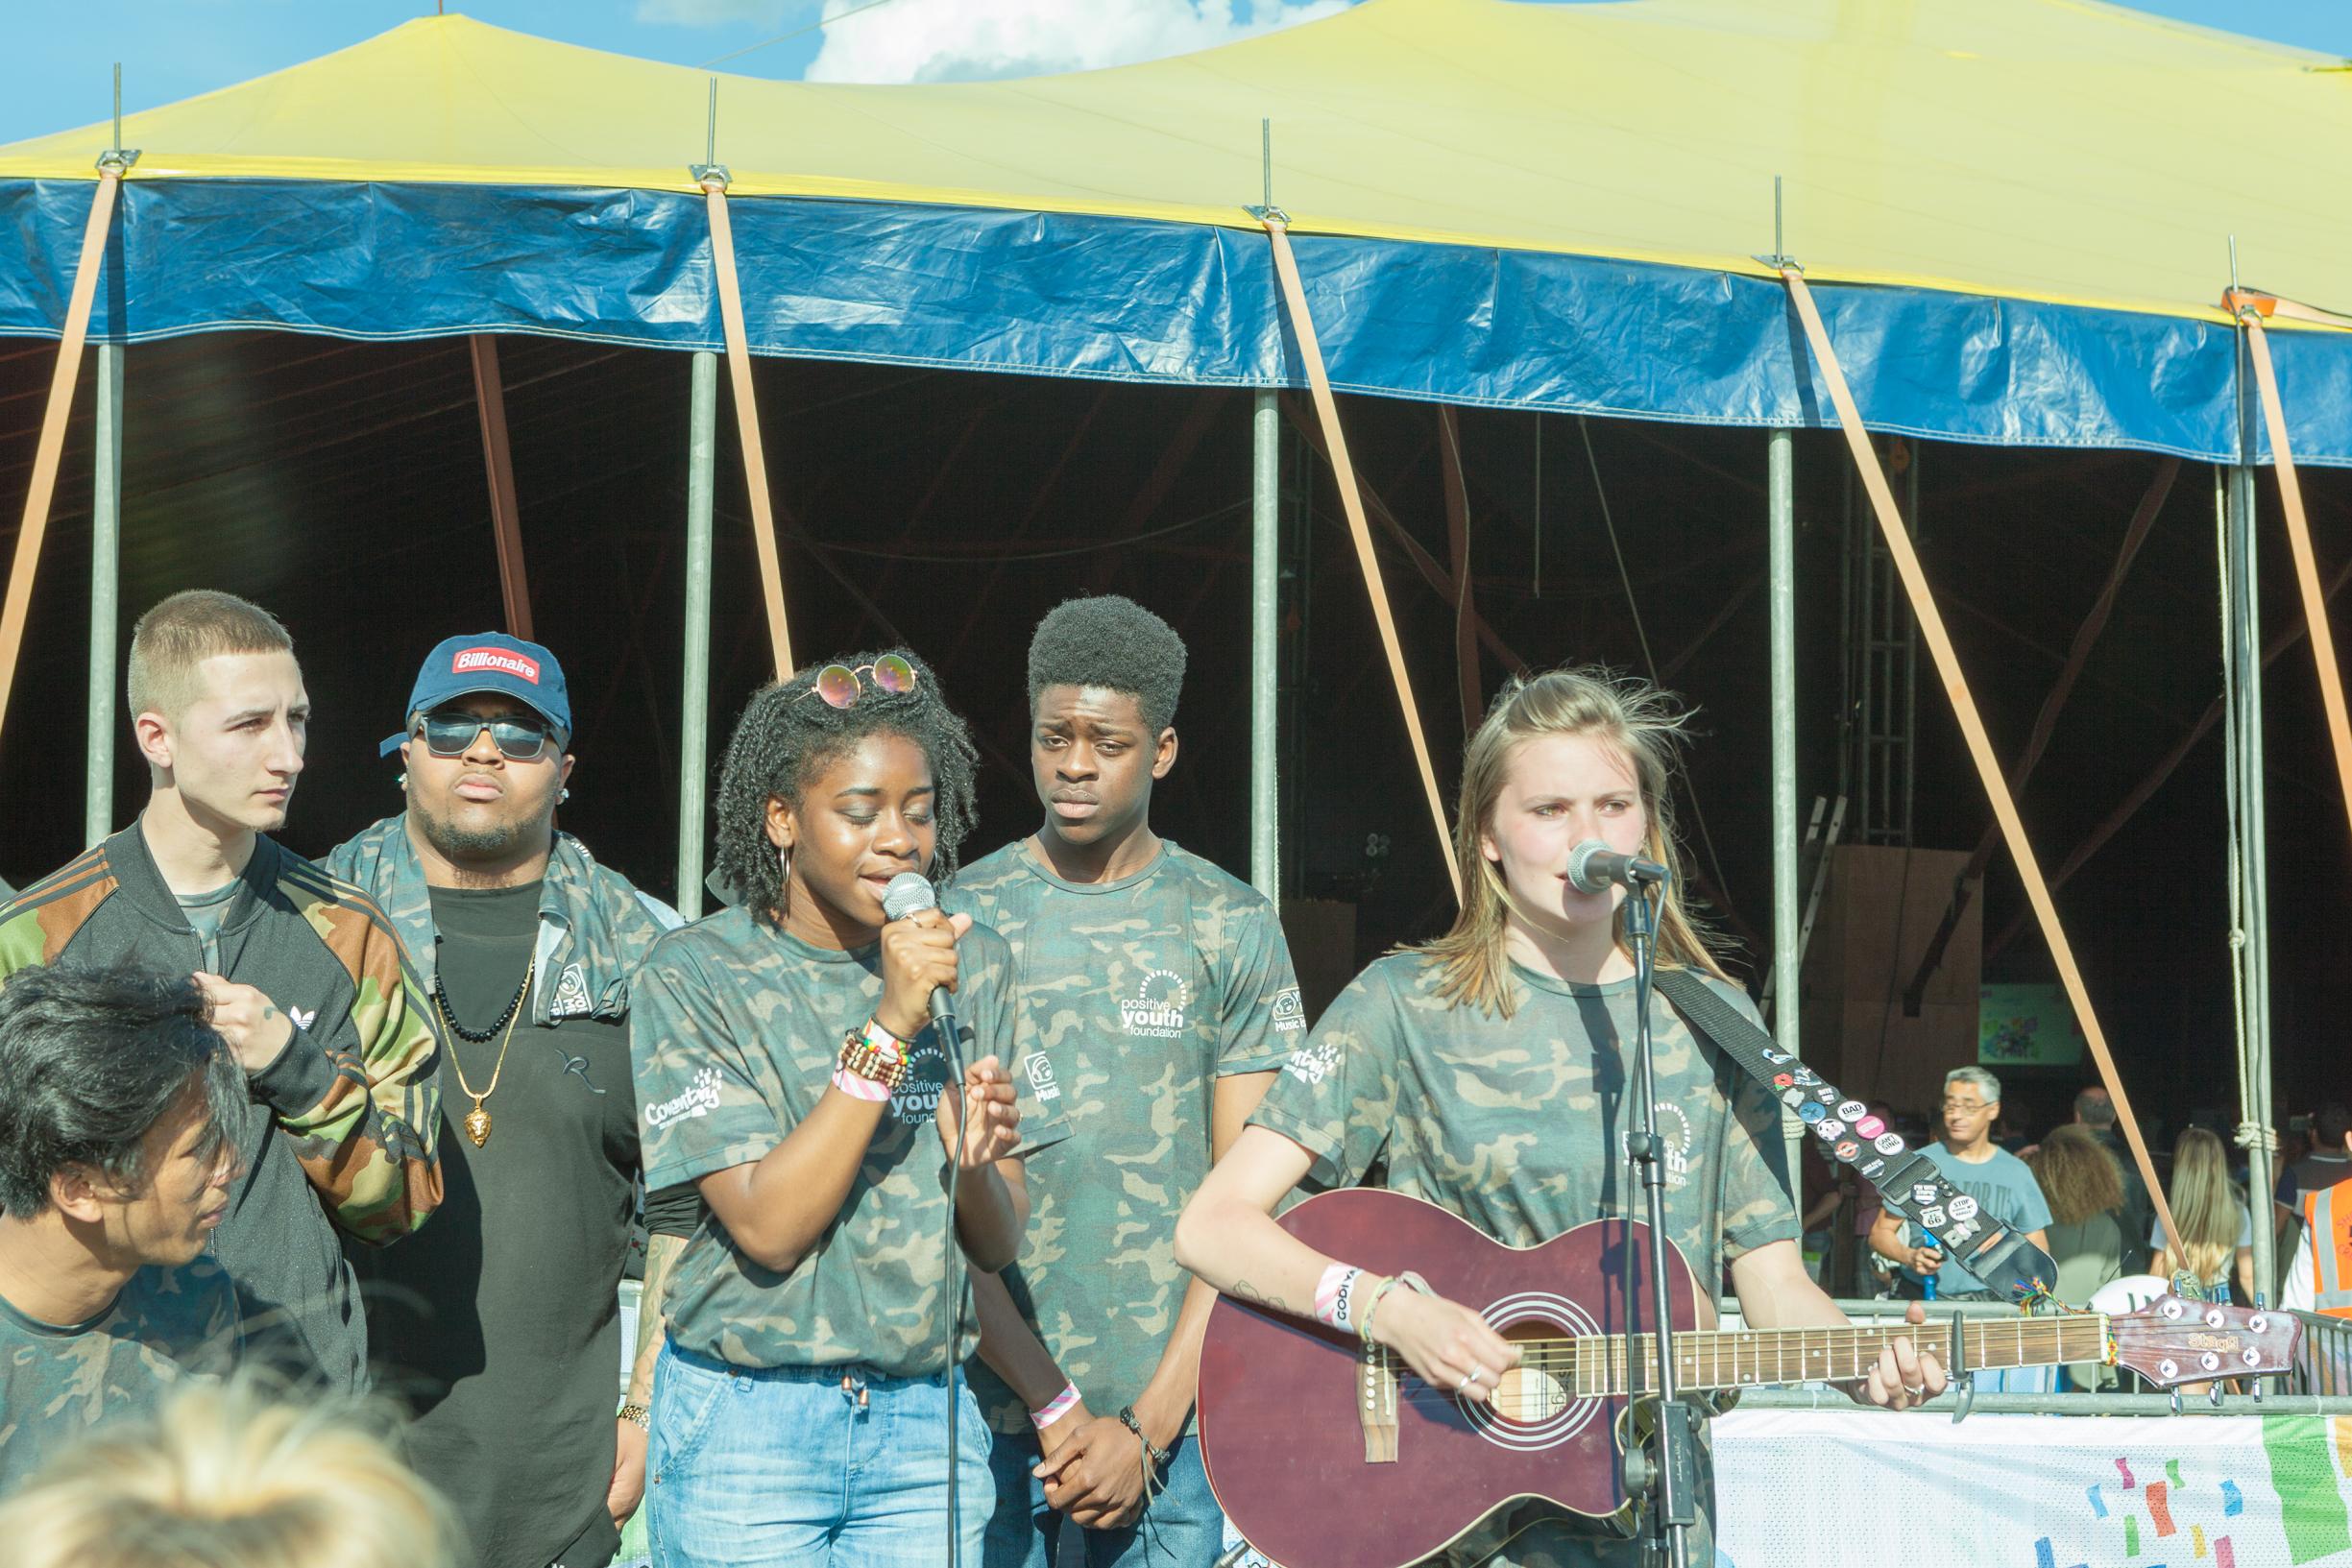 Kiaya Lyons Positive Youth foundation